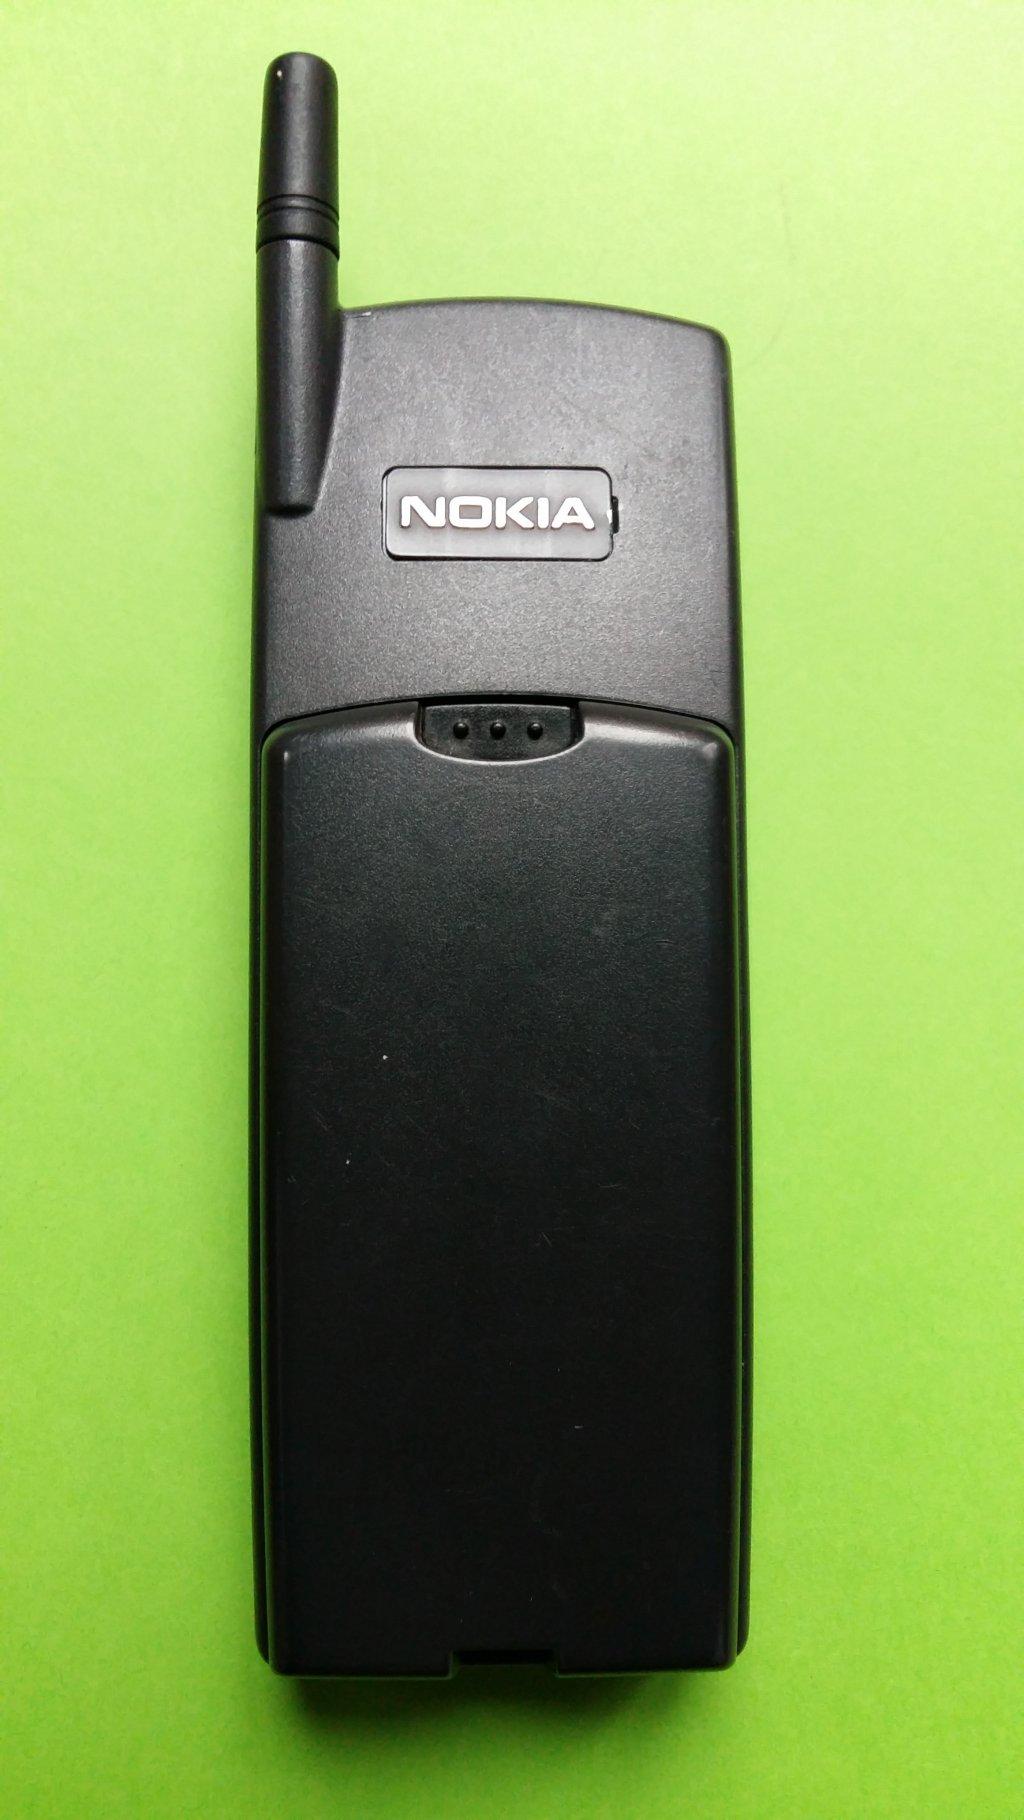 Nokia 8110 Asha 501 Dual Sim Resmi Cyan Image 8584547 24w640